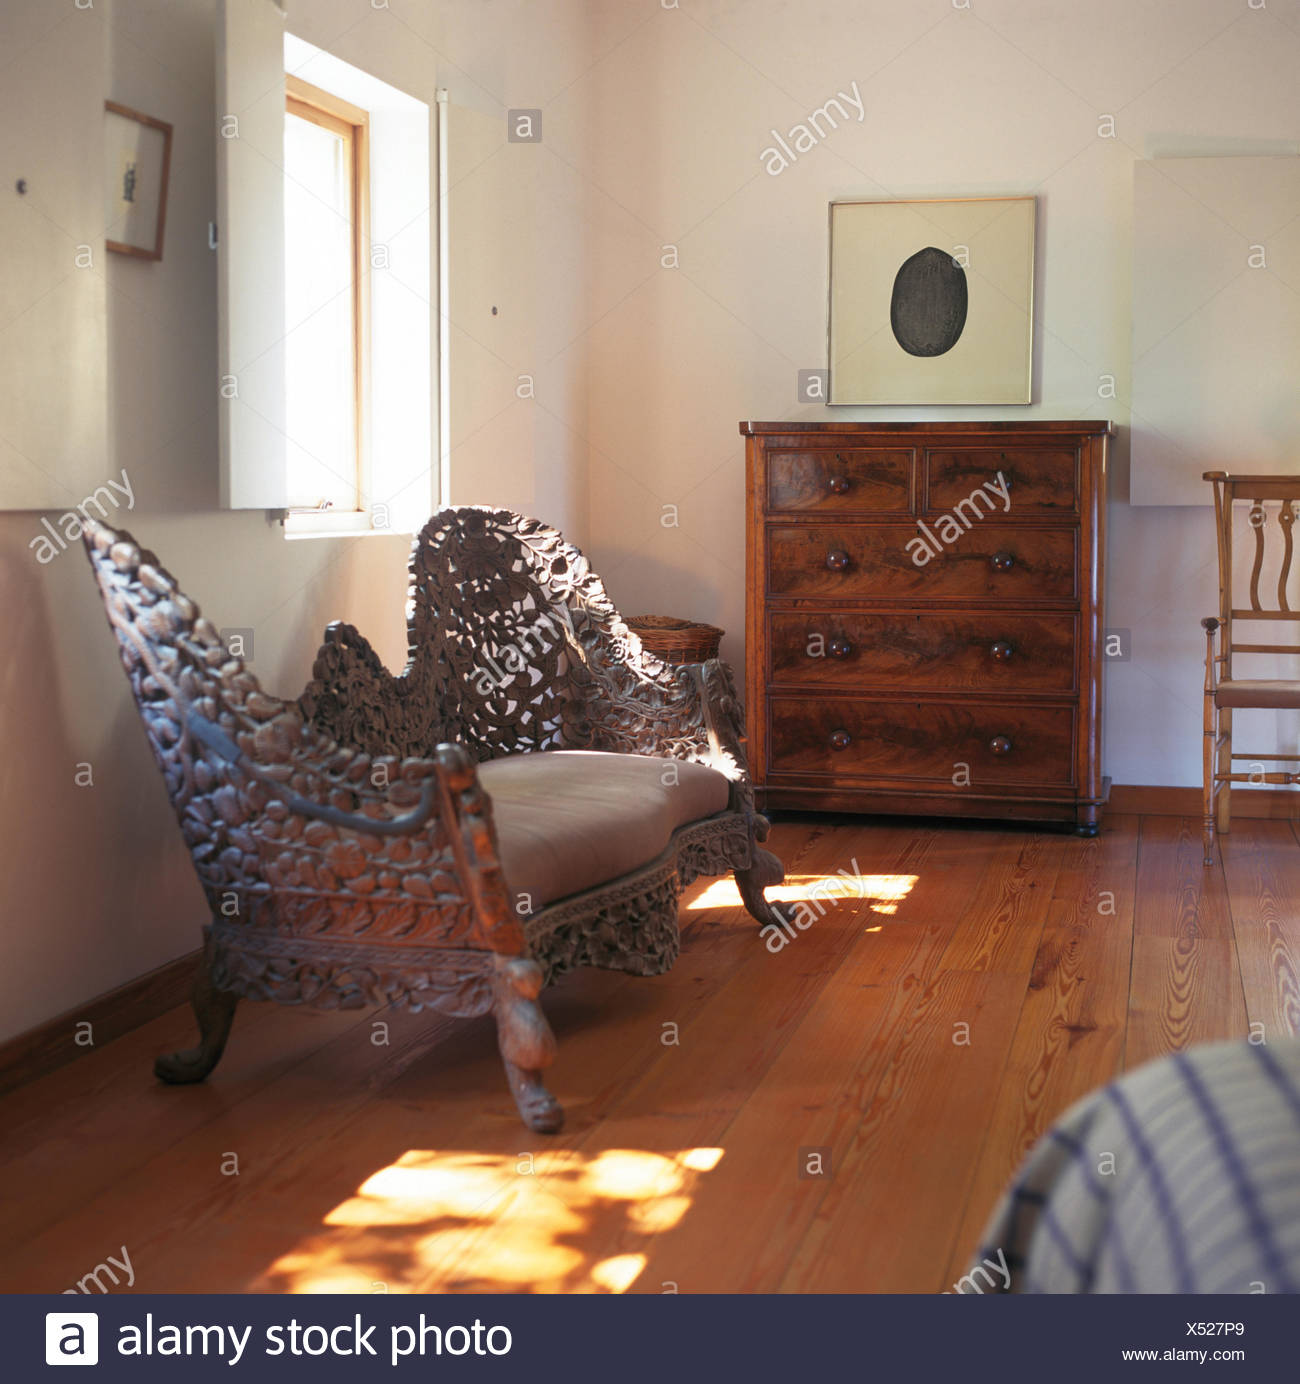 Seems good Asian style sofa congratulate